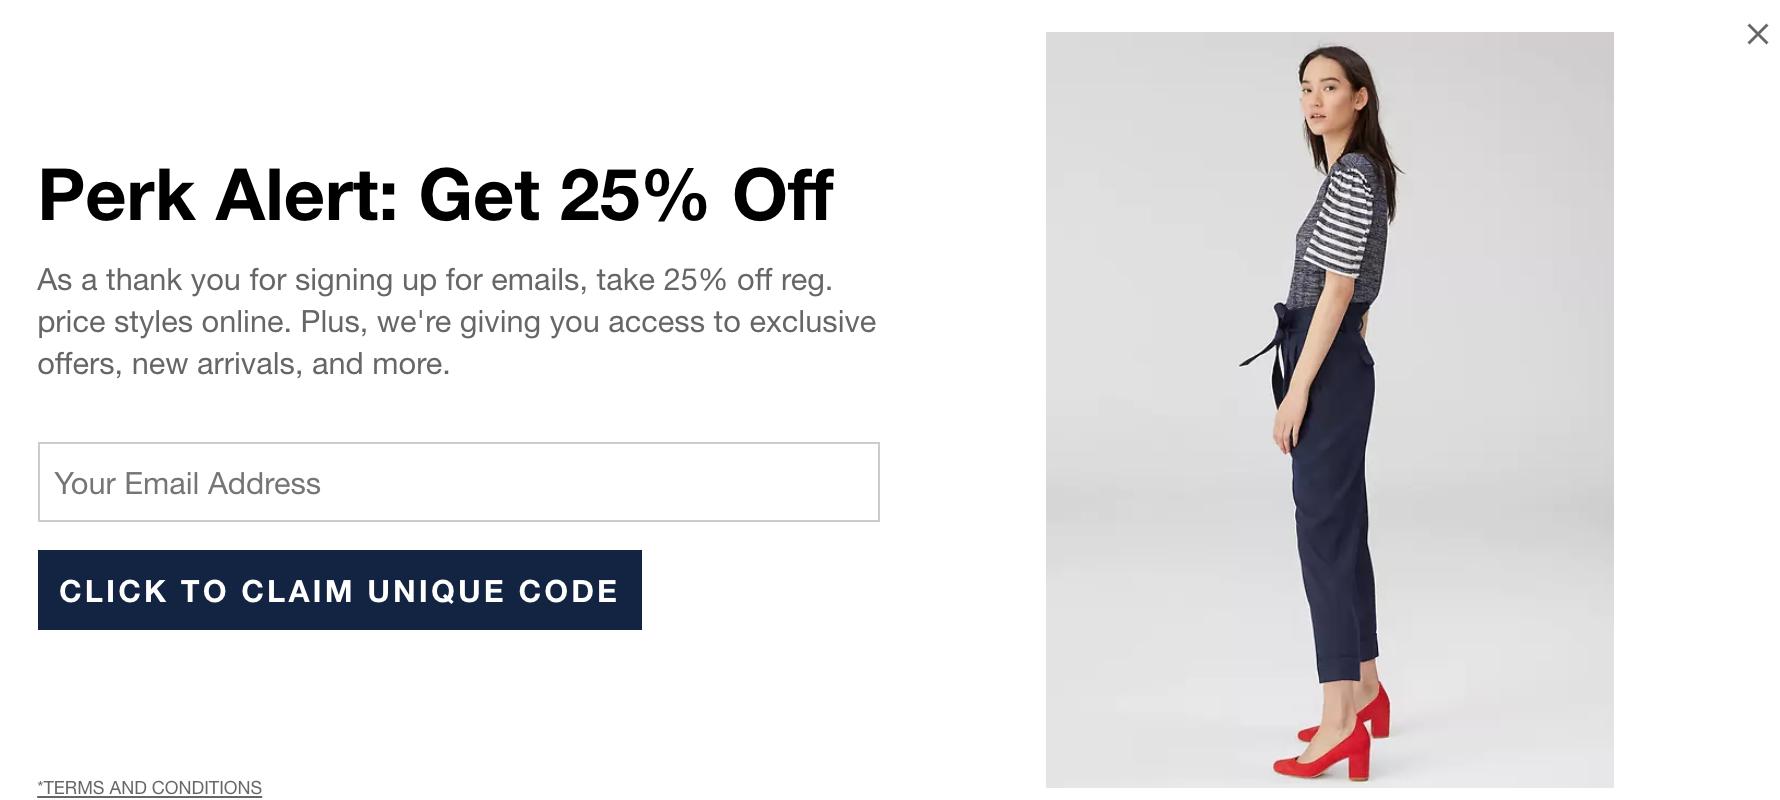 GAP website marketing